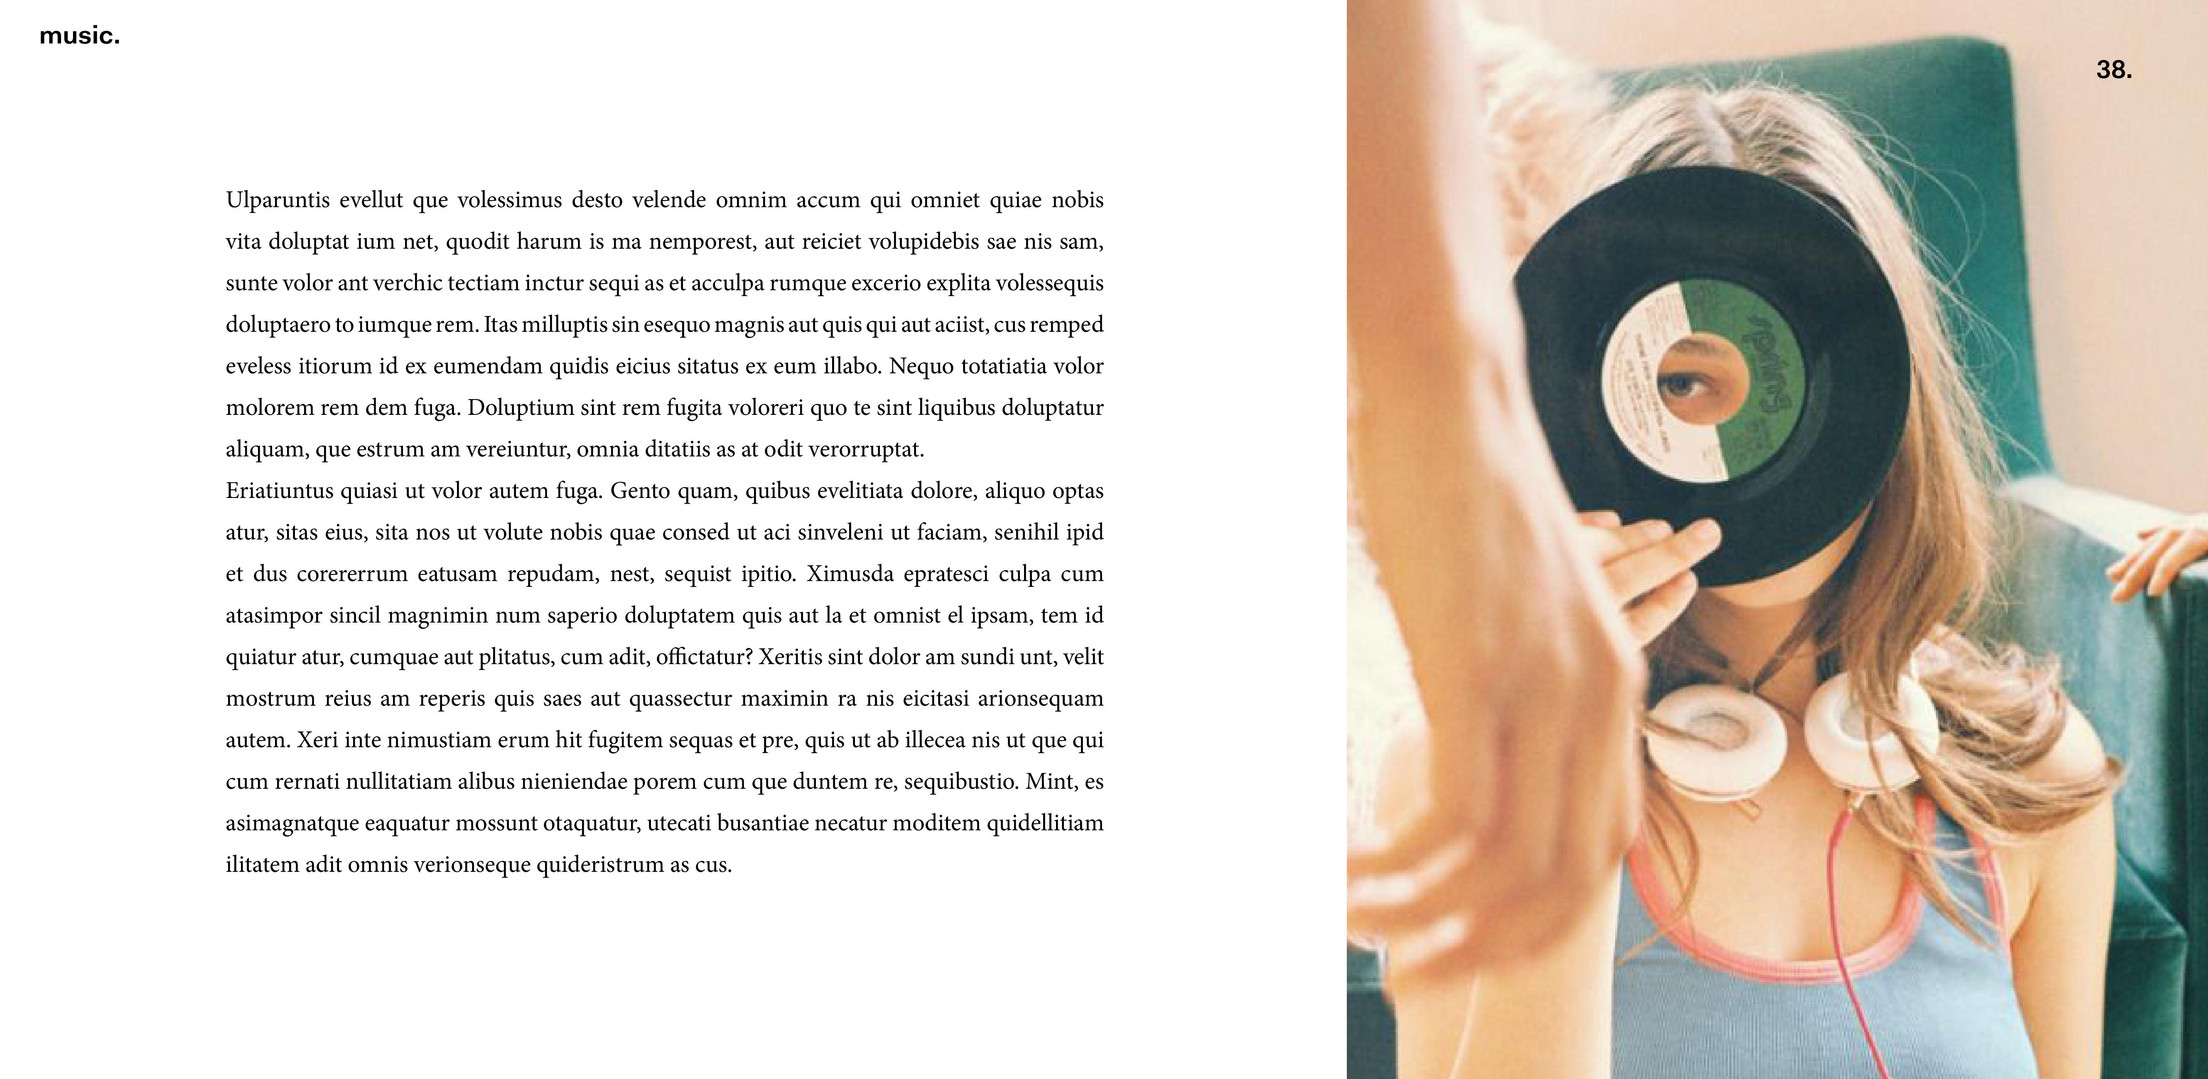 SC_DOVE_lorem ipsum-page-038.jpg